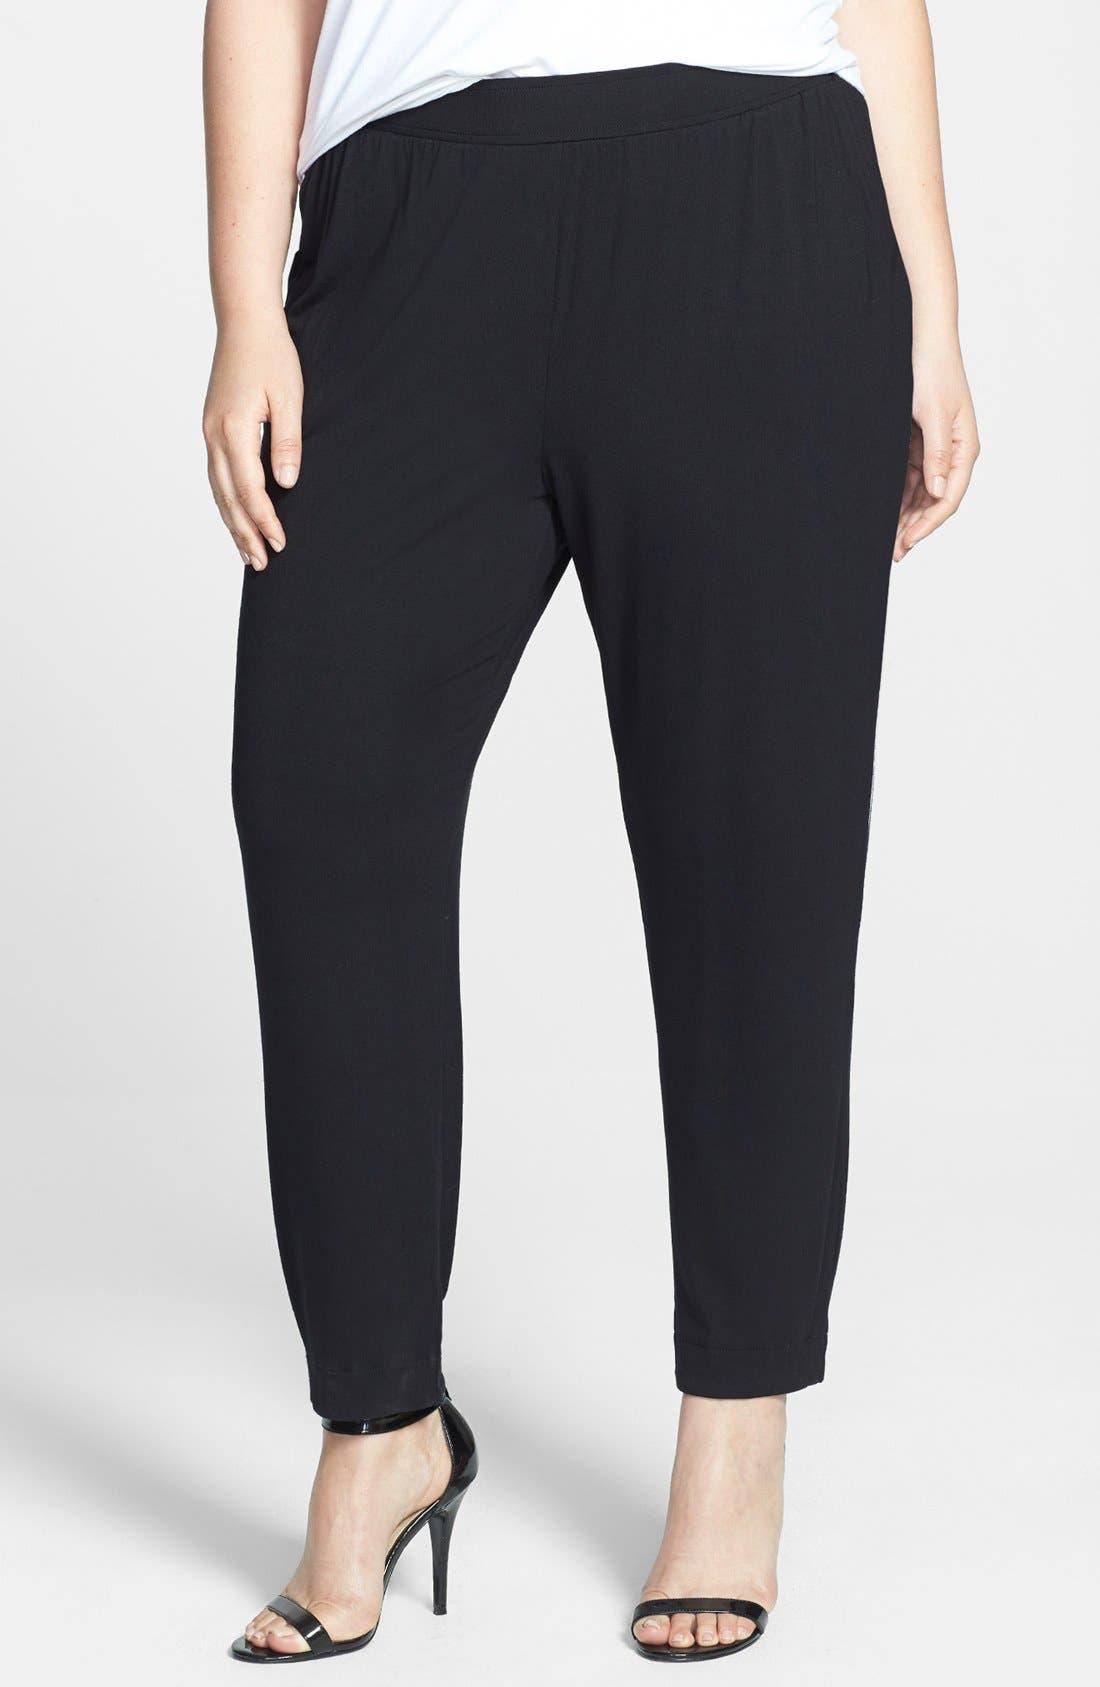 Alternate Image 1 Selected - Sejour Knit Ankle Pants (Plus Size)